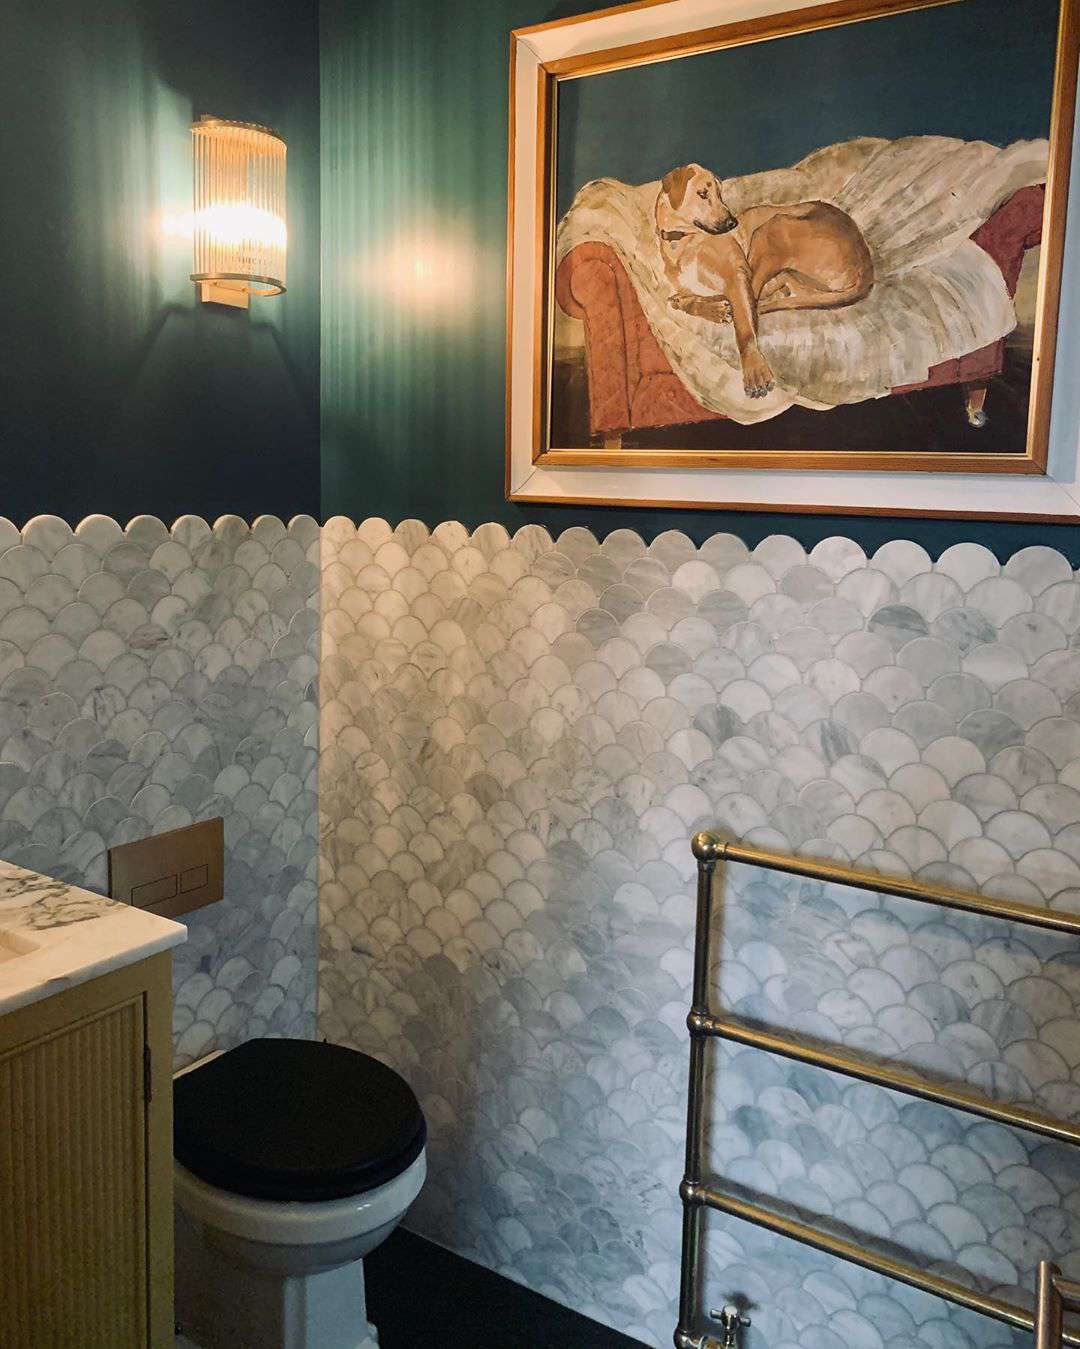 Bathroom with gray scallop tiles